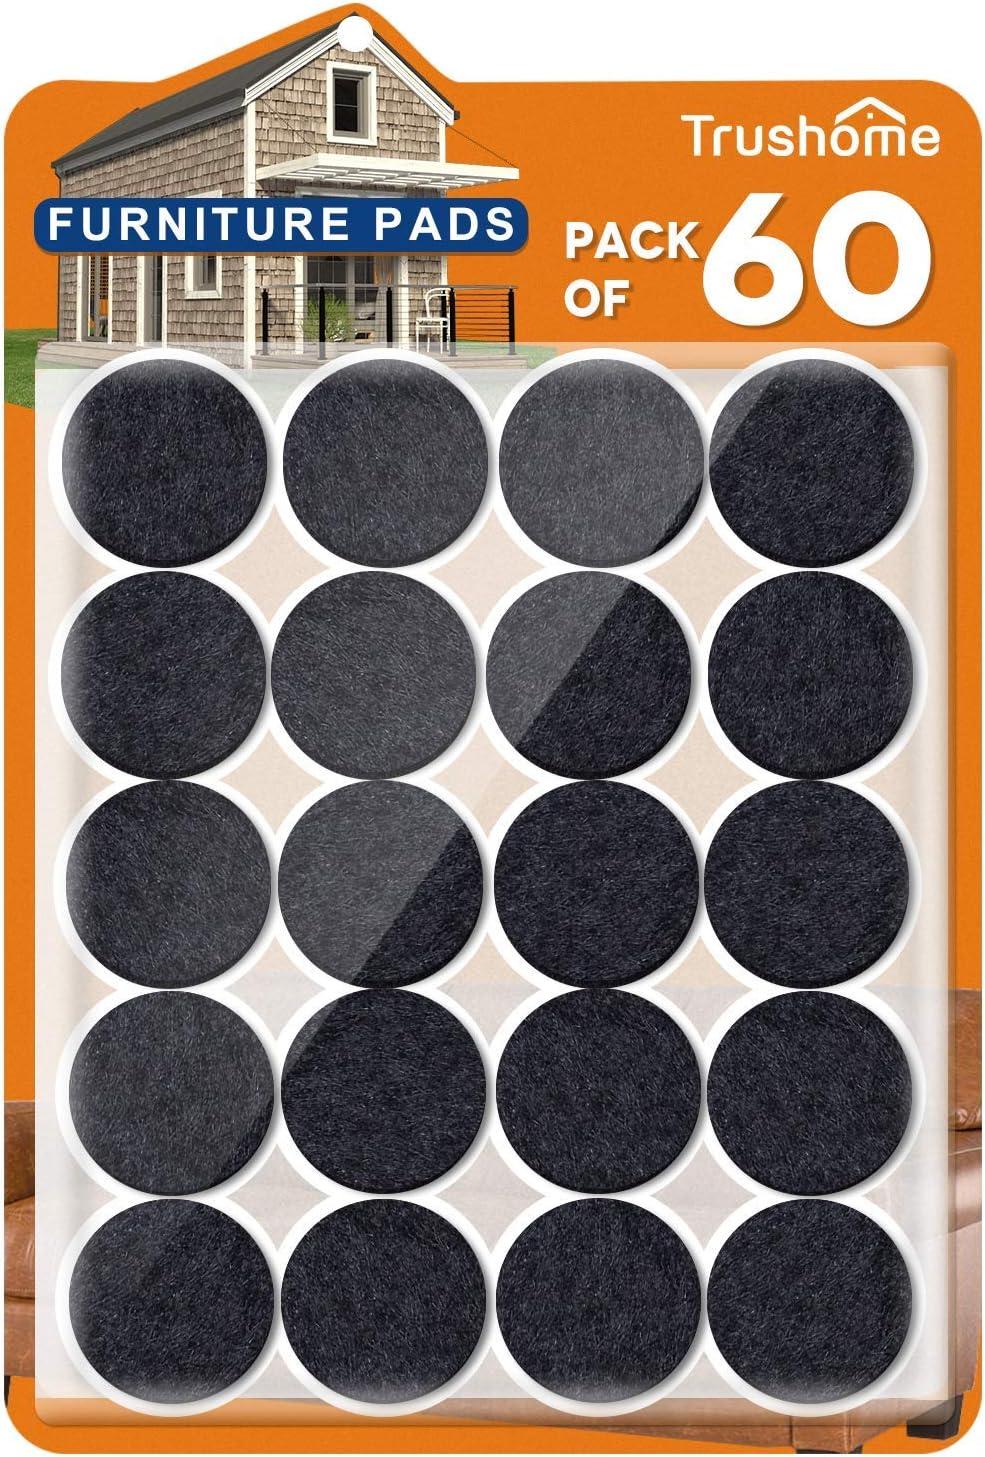 Furniture Felt Pads 60 Pack Premium Furniture Pads Black, 1 inch Self Adhesive Chair Felt Pads for Furniture Feet, Anti Scratch Felt Pads Floor Protector for Furniture Legs Hardwood Floors